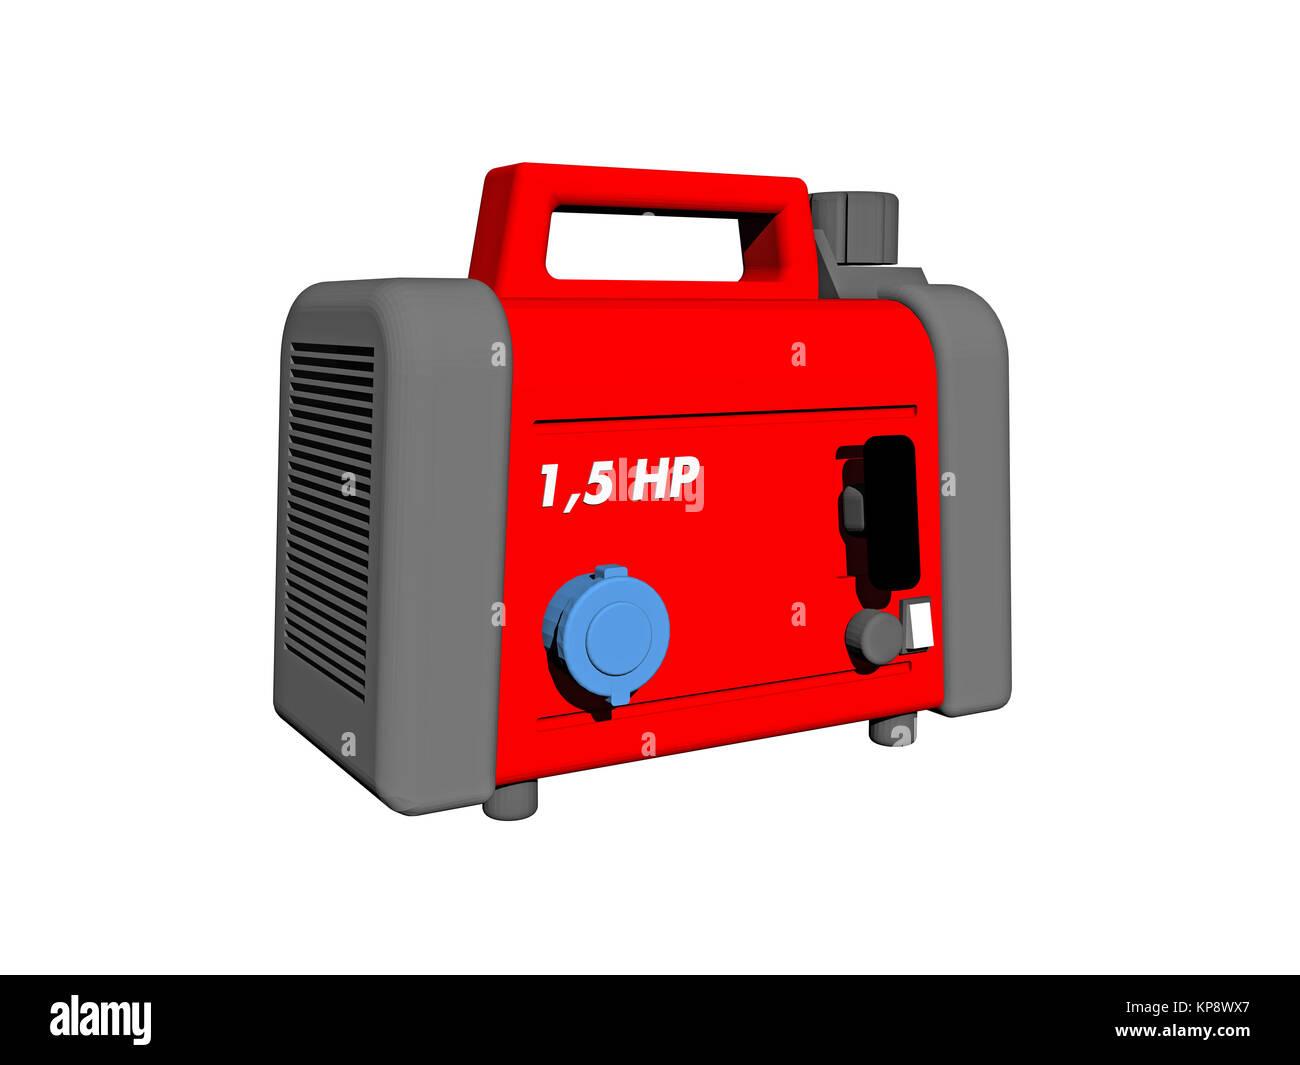 Großartig Denso Mini Generator Schaltplan Ideen - Der Schaltplan ...